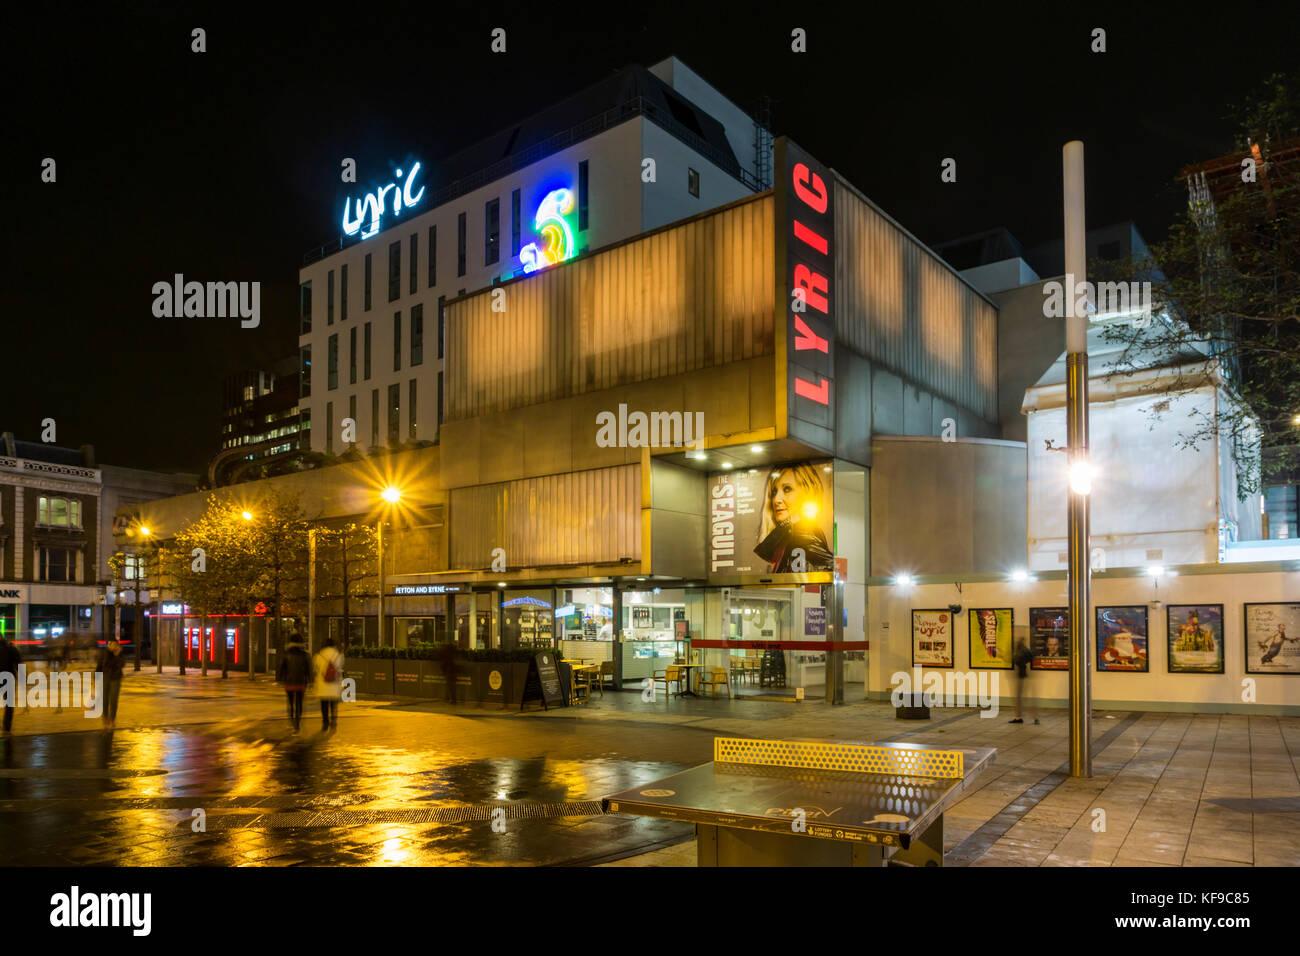 The Lyric Theatre, Hammersmith, at night. - Stock Image